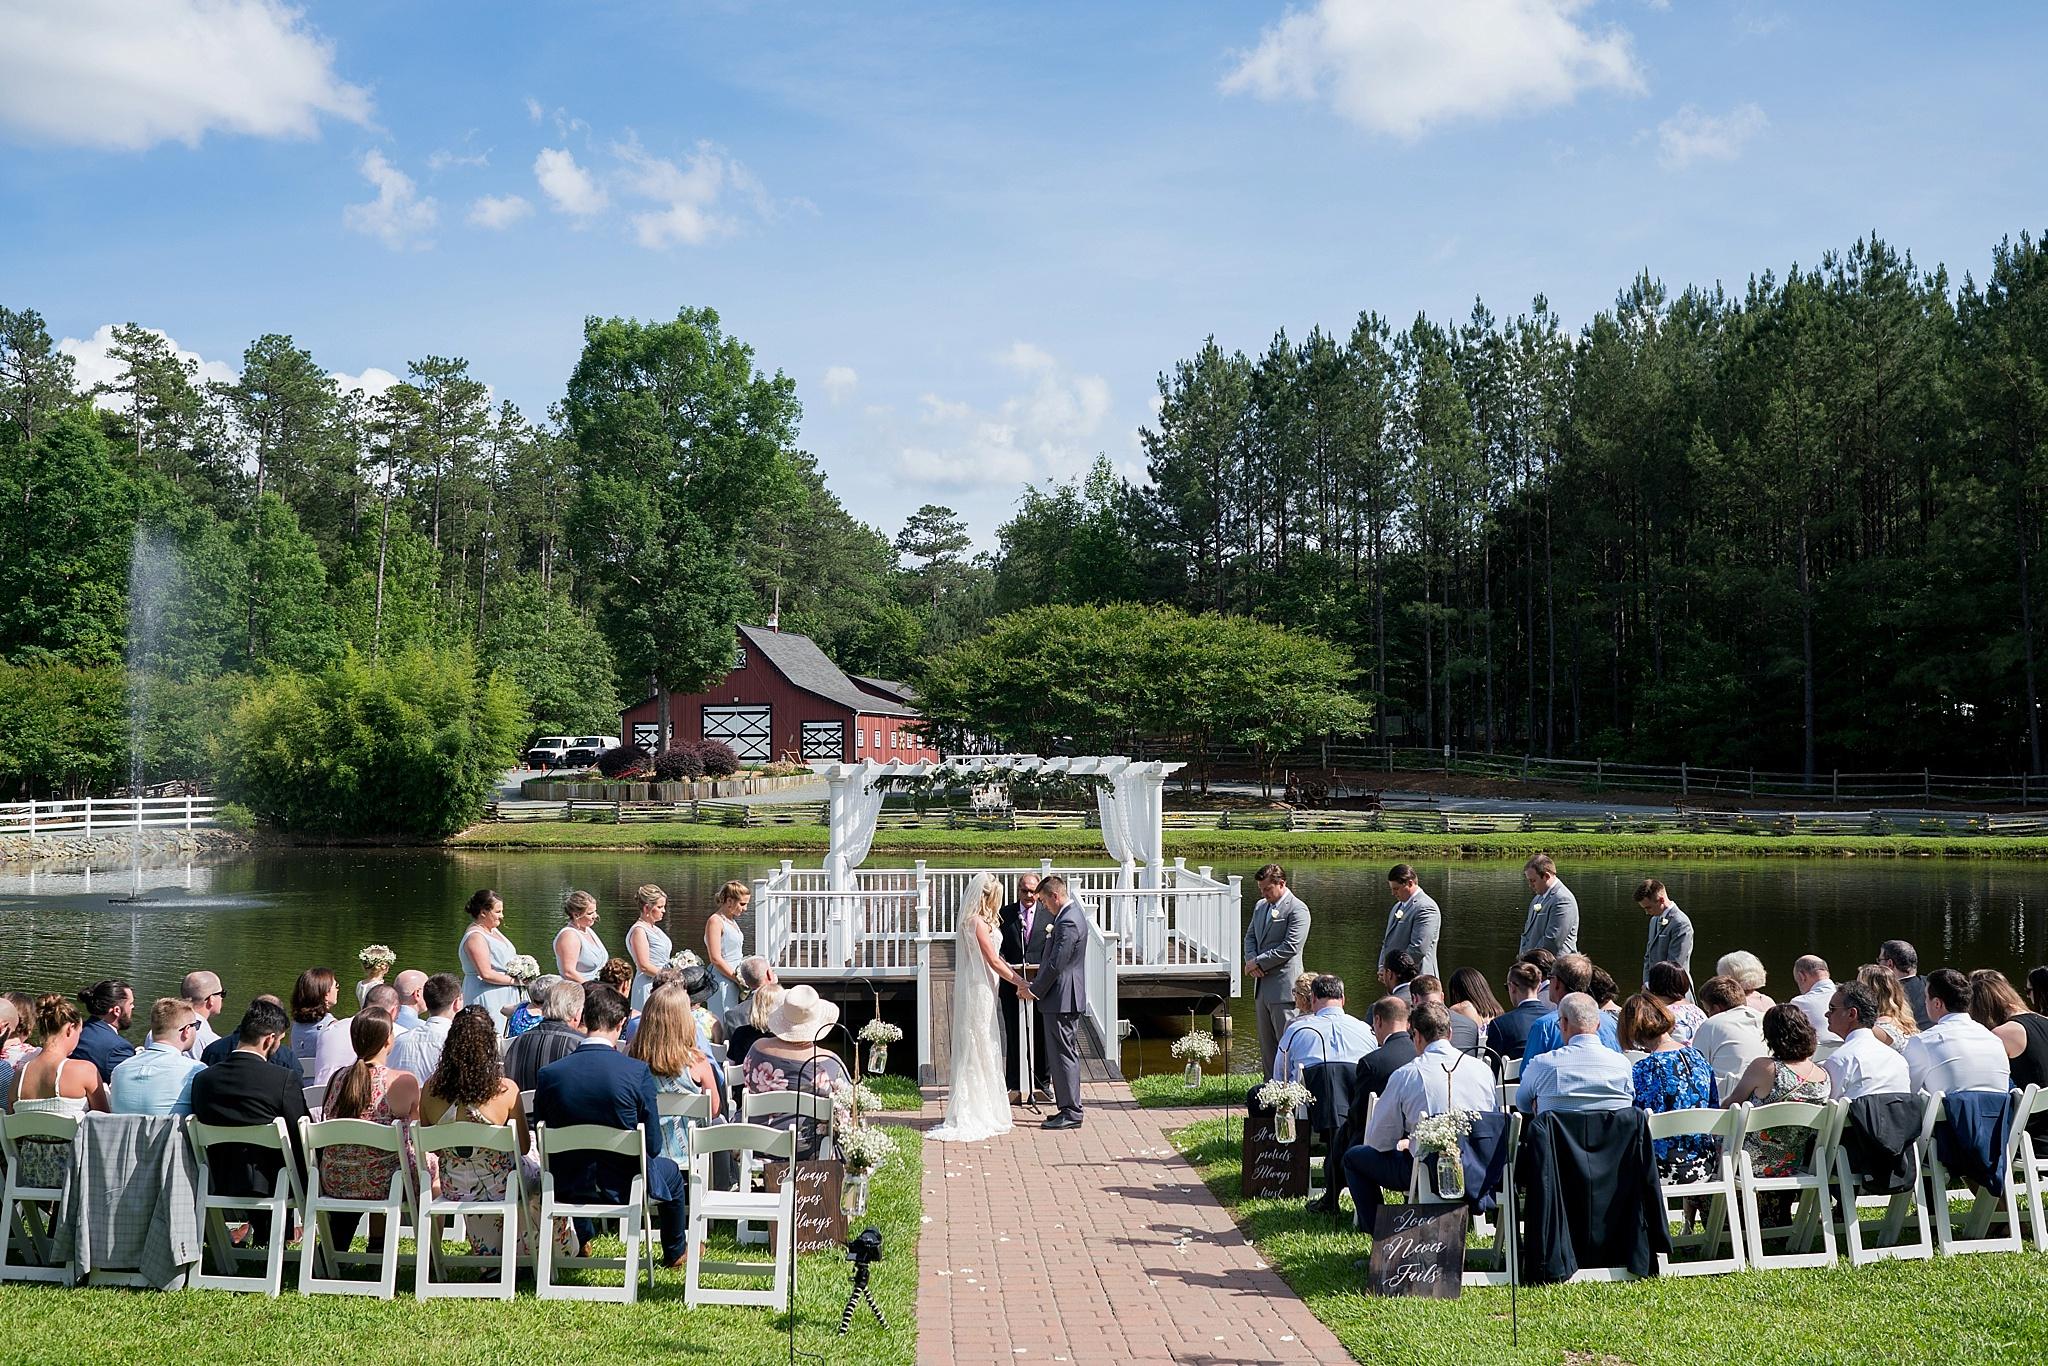 Shady-Wagon-Farm-NC-Wedding-Photographer-0166.jpg